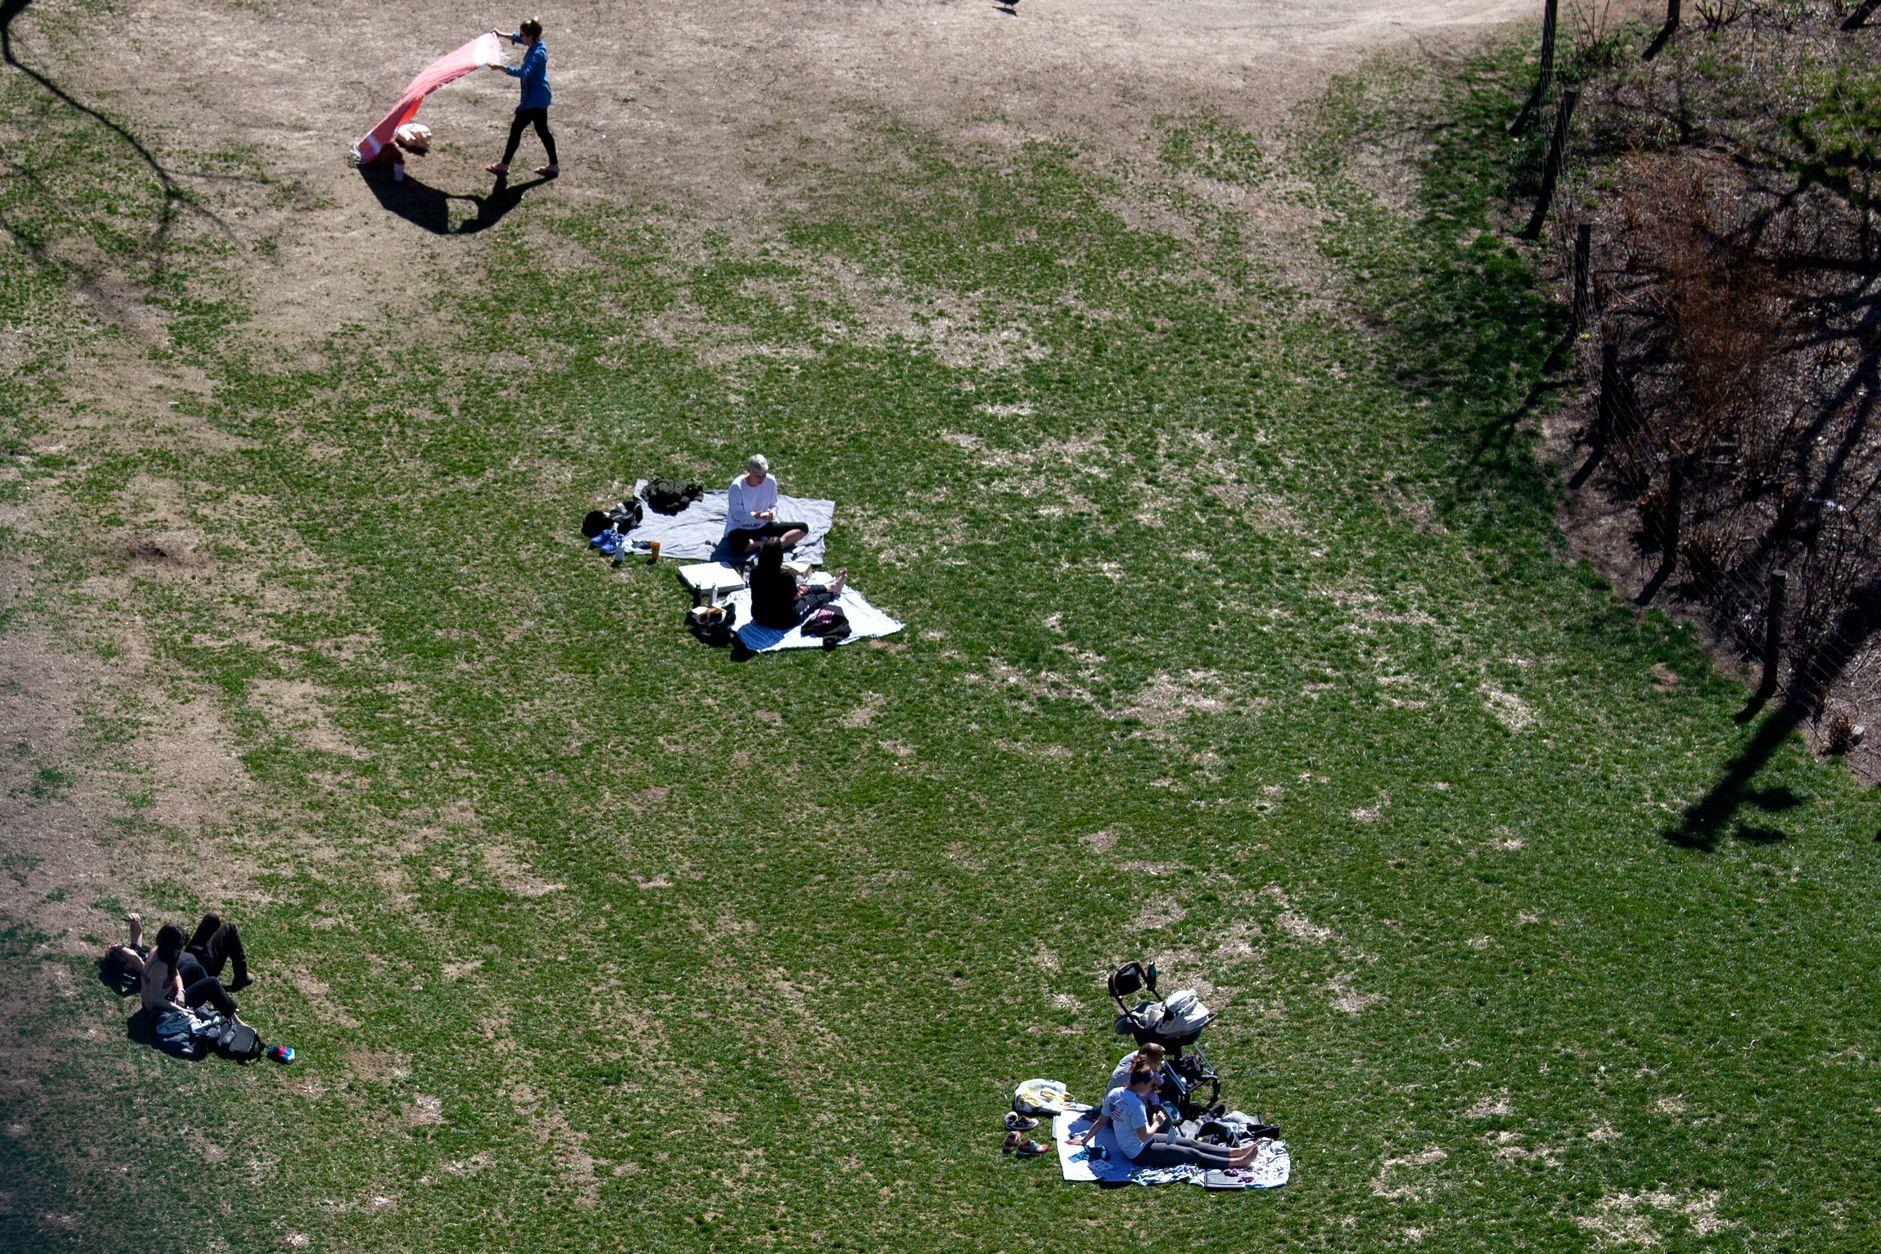 People practice social distancing in DUMBO's Main Street Park during the coronavirus outbreak.